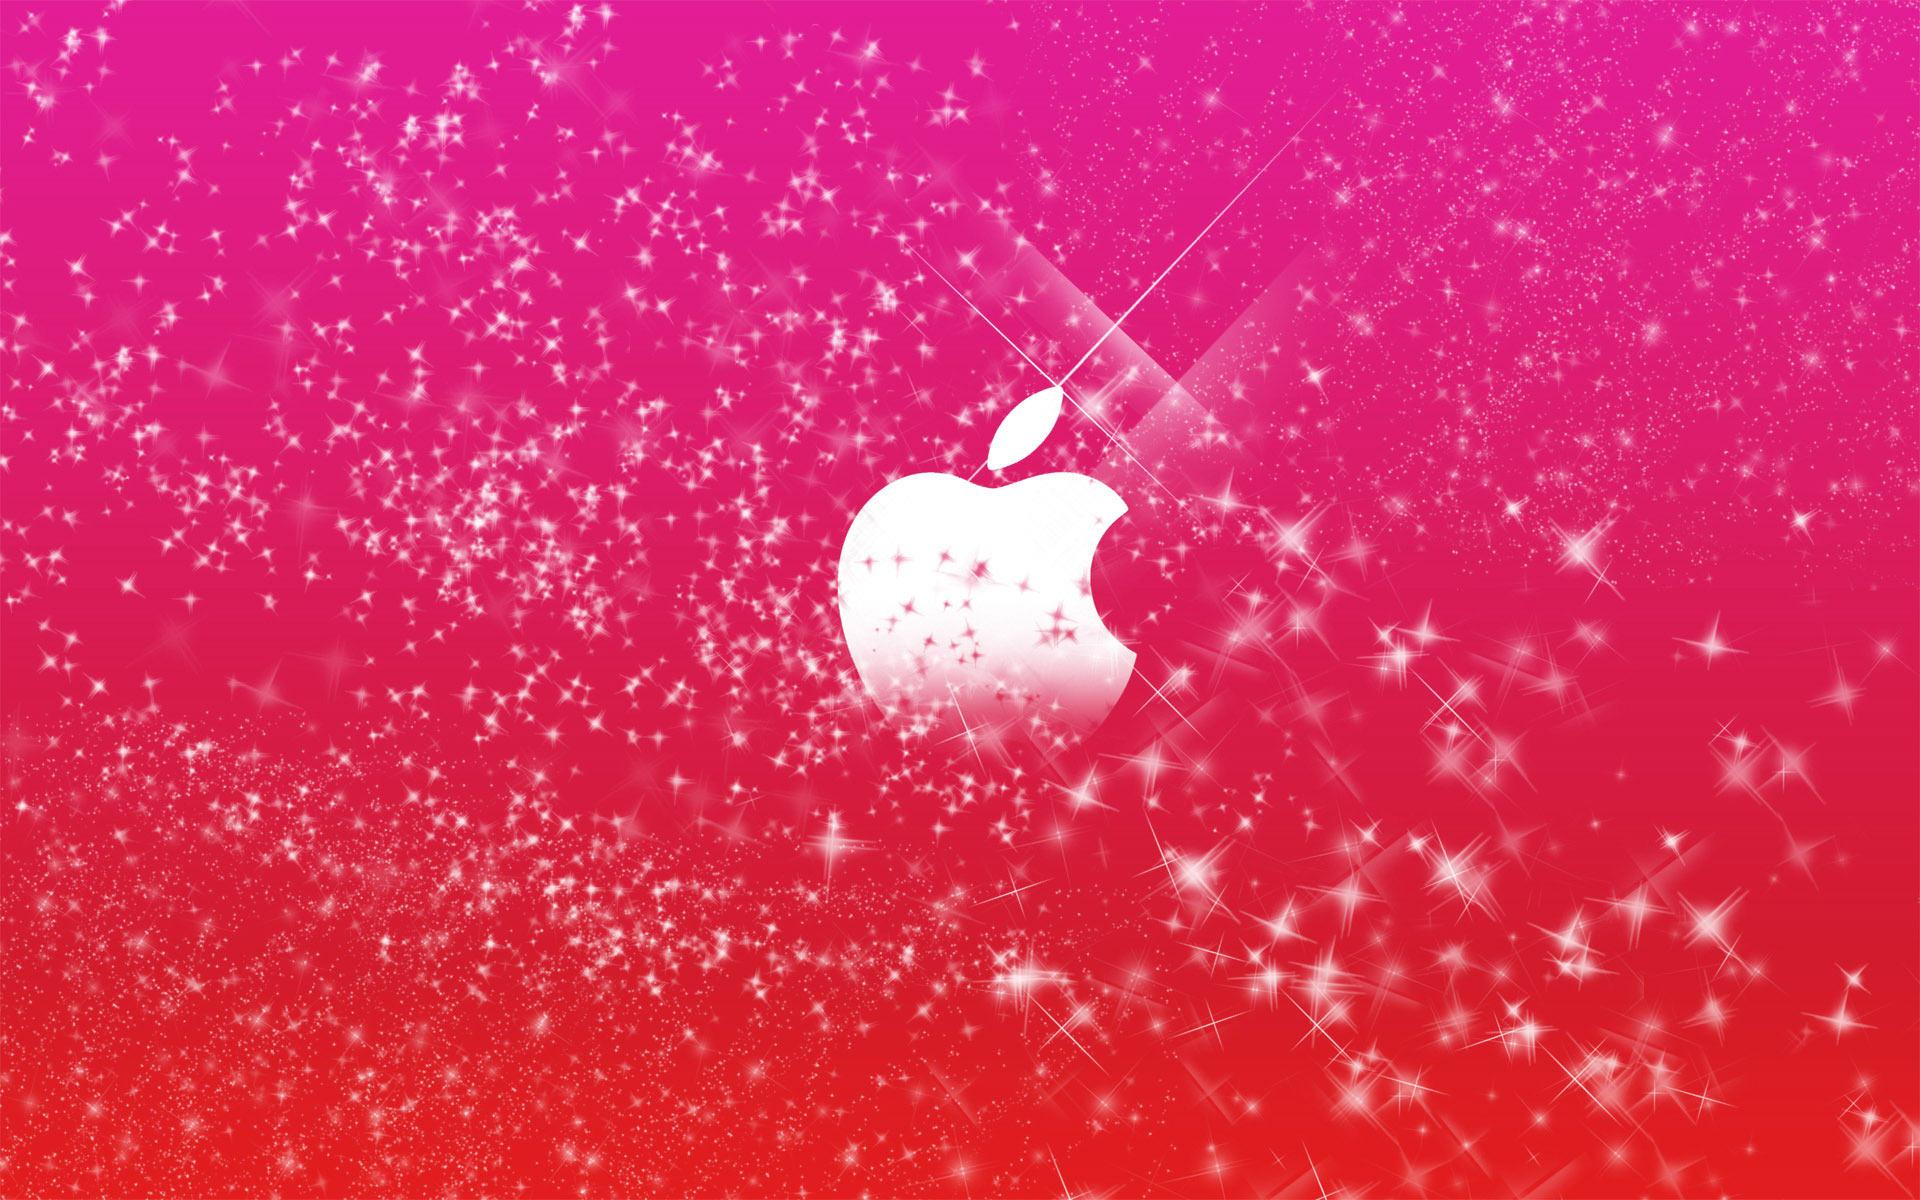 70 Pink Mac Wallpaper On Wallpapersafari Desktop mac background pink is a 1920x1080 hd wallpaper picture for your desktop, tablet or smartphone. 70 pink mac wallpaper on wallpapersafari